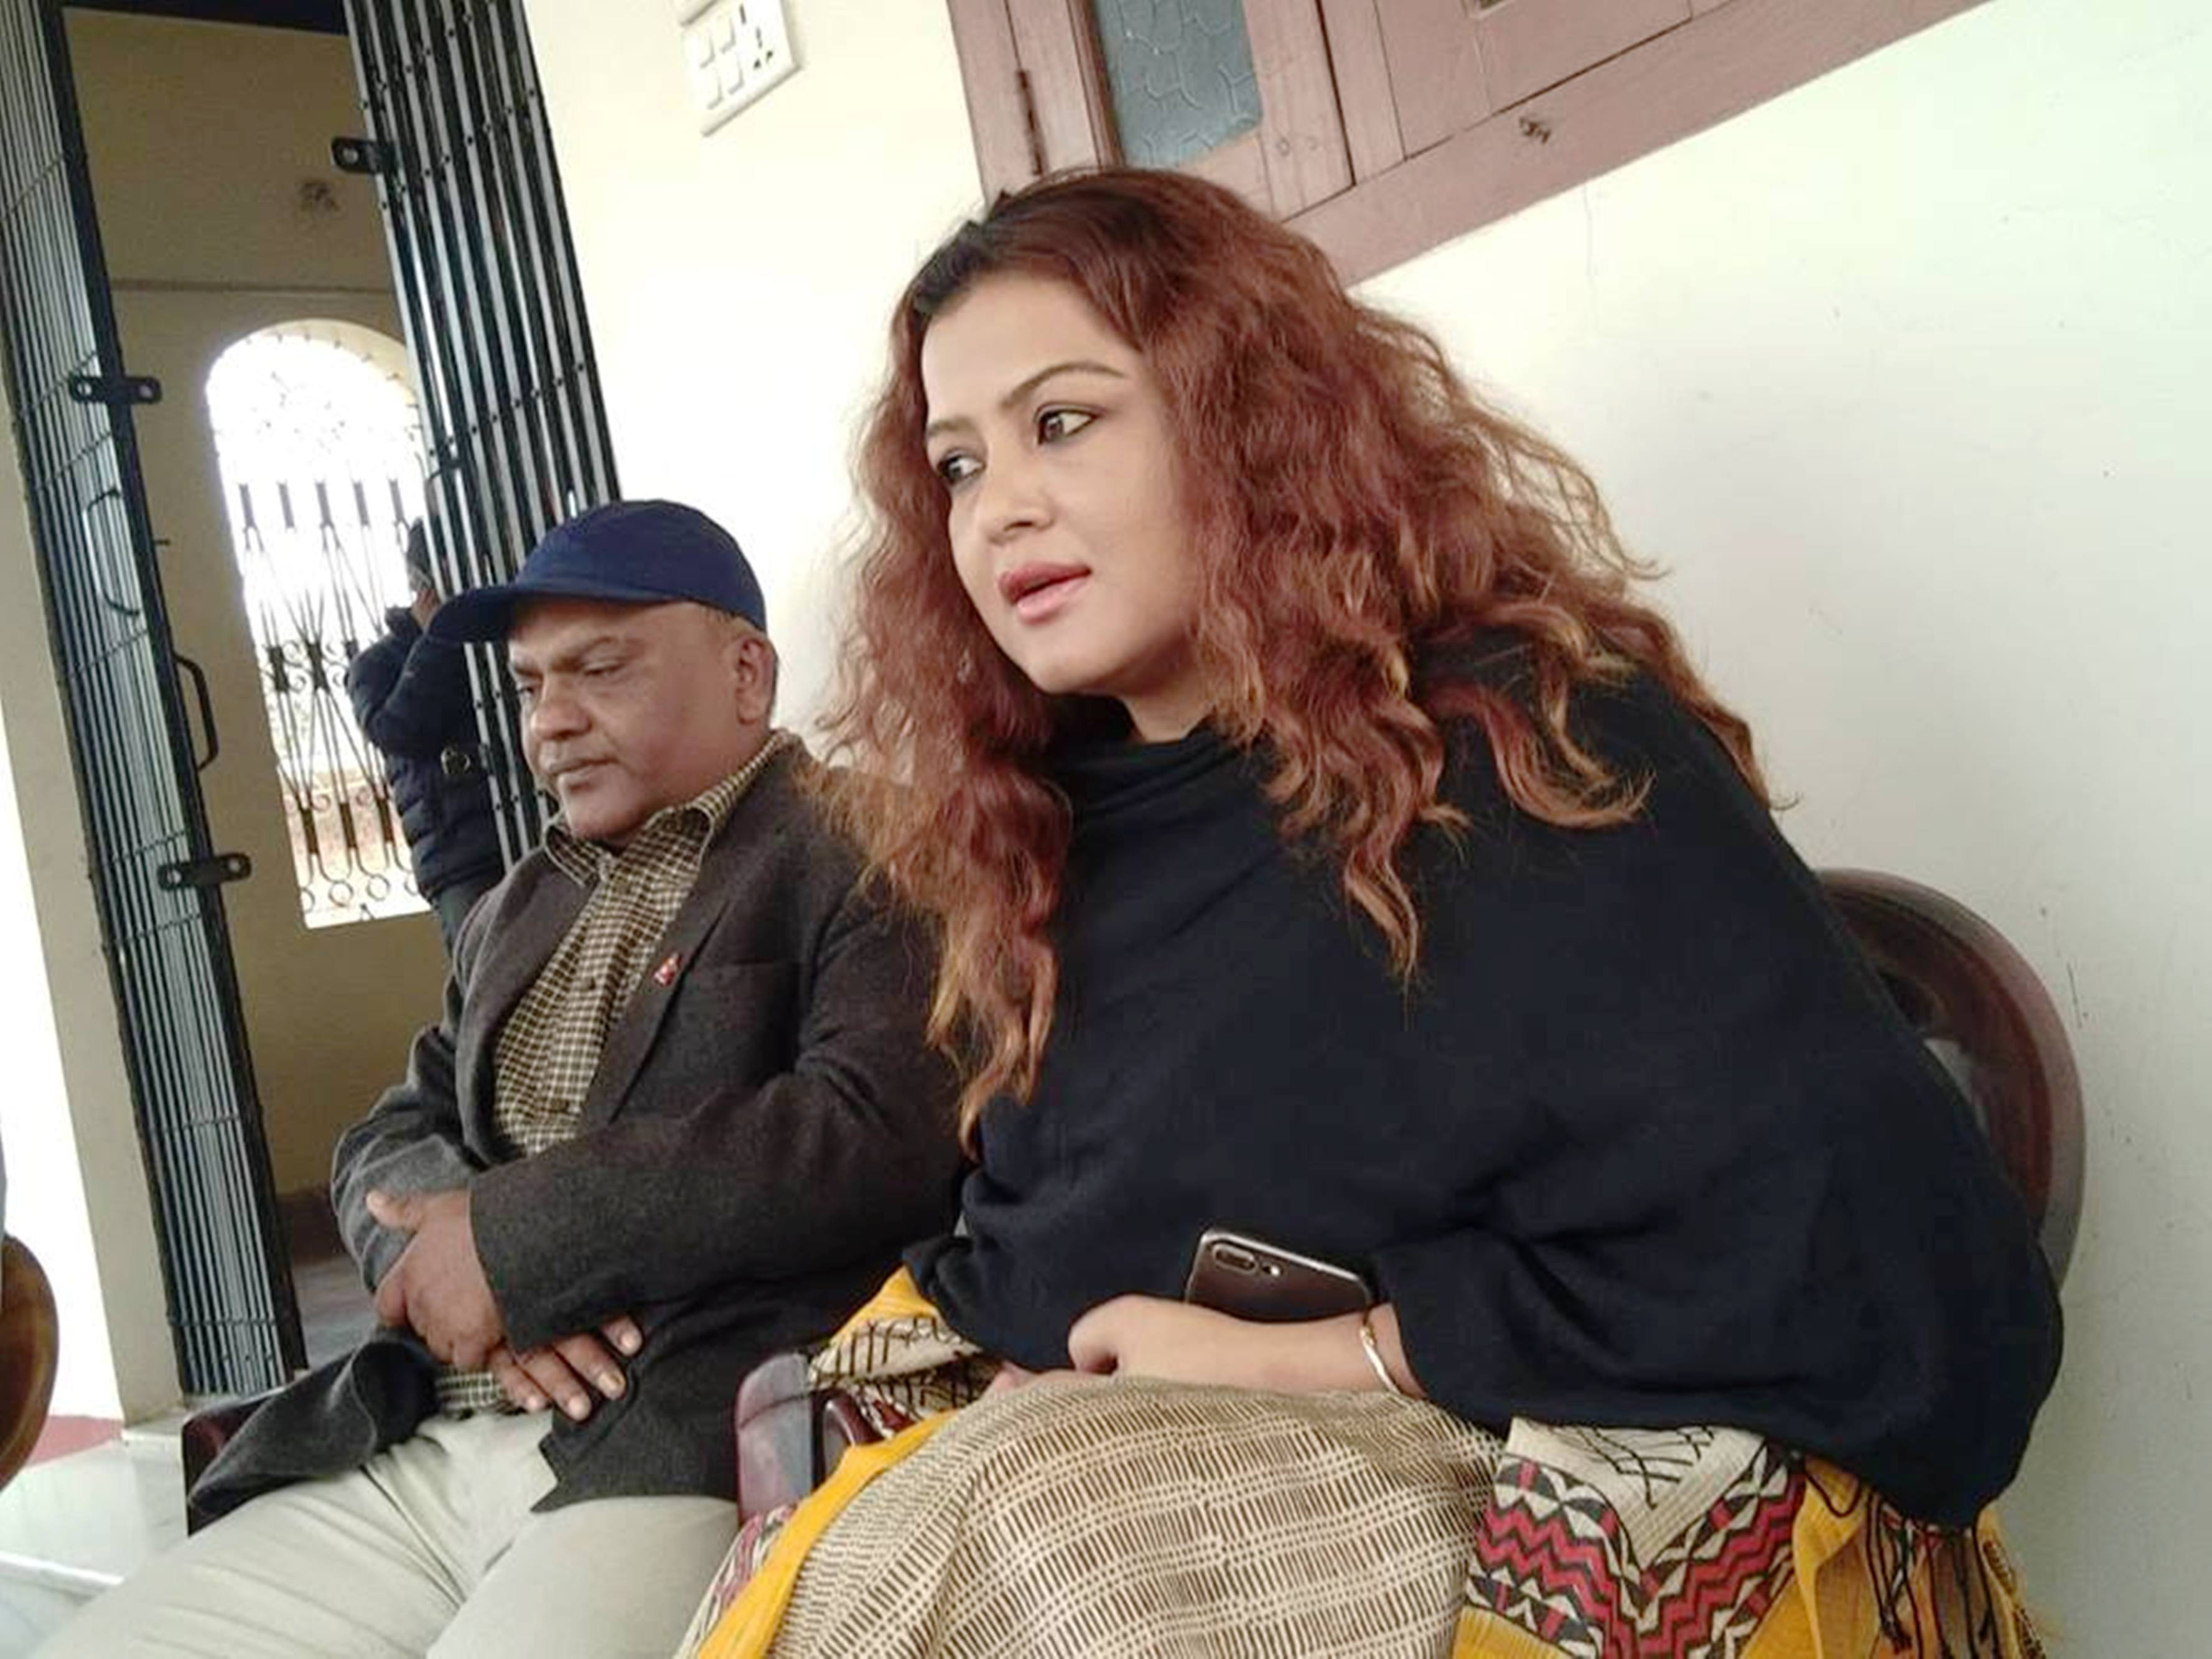 Actress Rekha Thapa speaks to media persons at Gaur on Wednesday, November 28, 2018. Photo: Prabhat Kumar Jha/THT